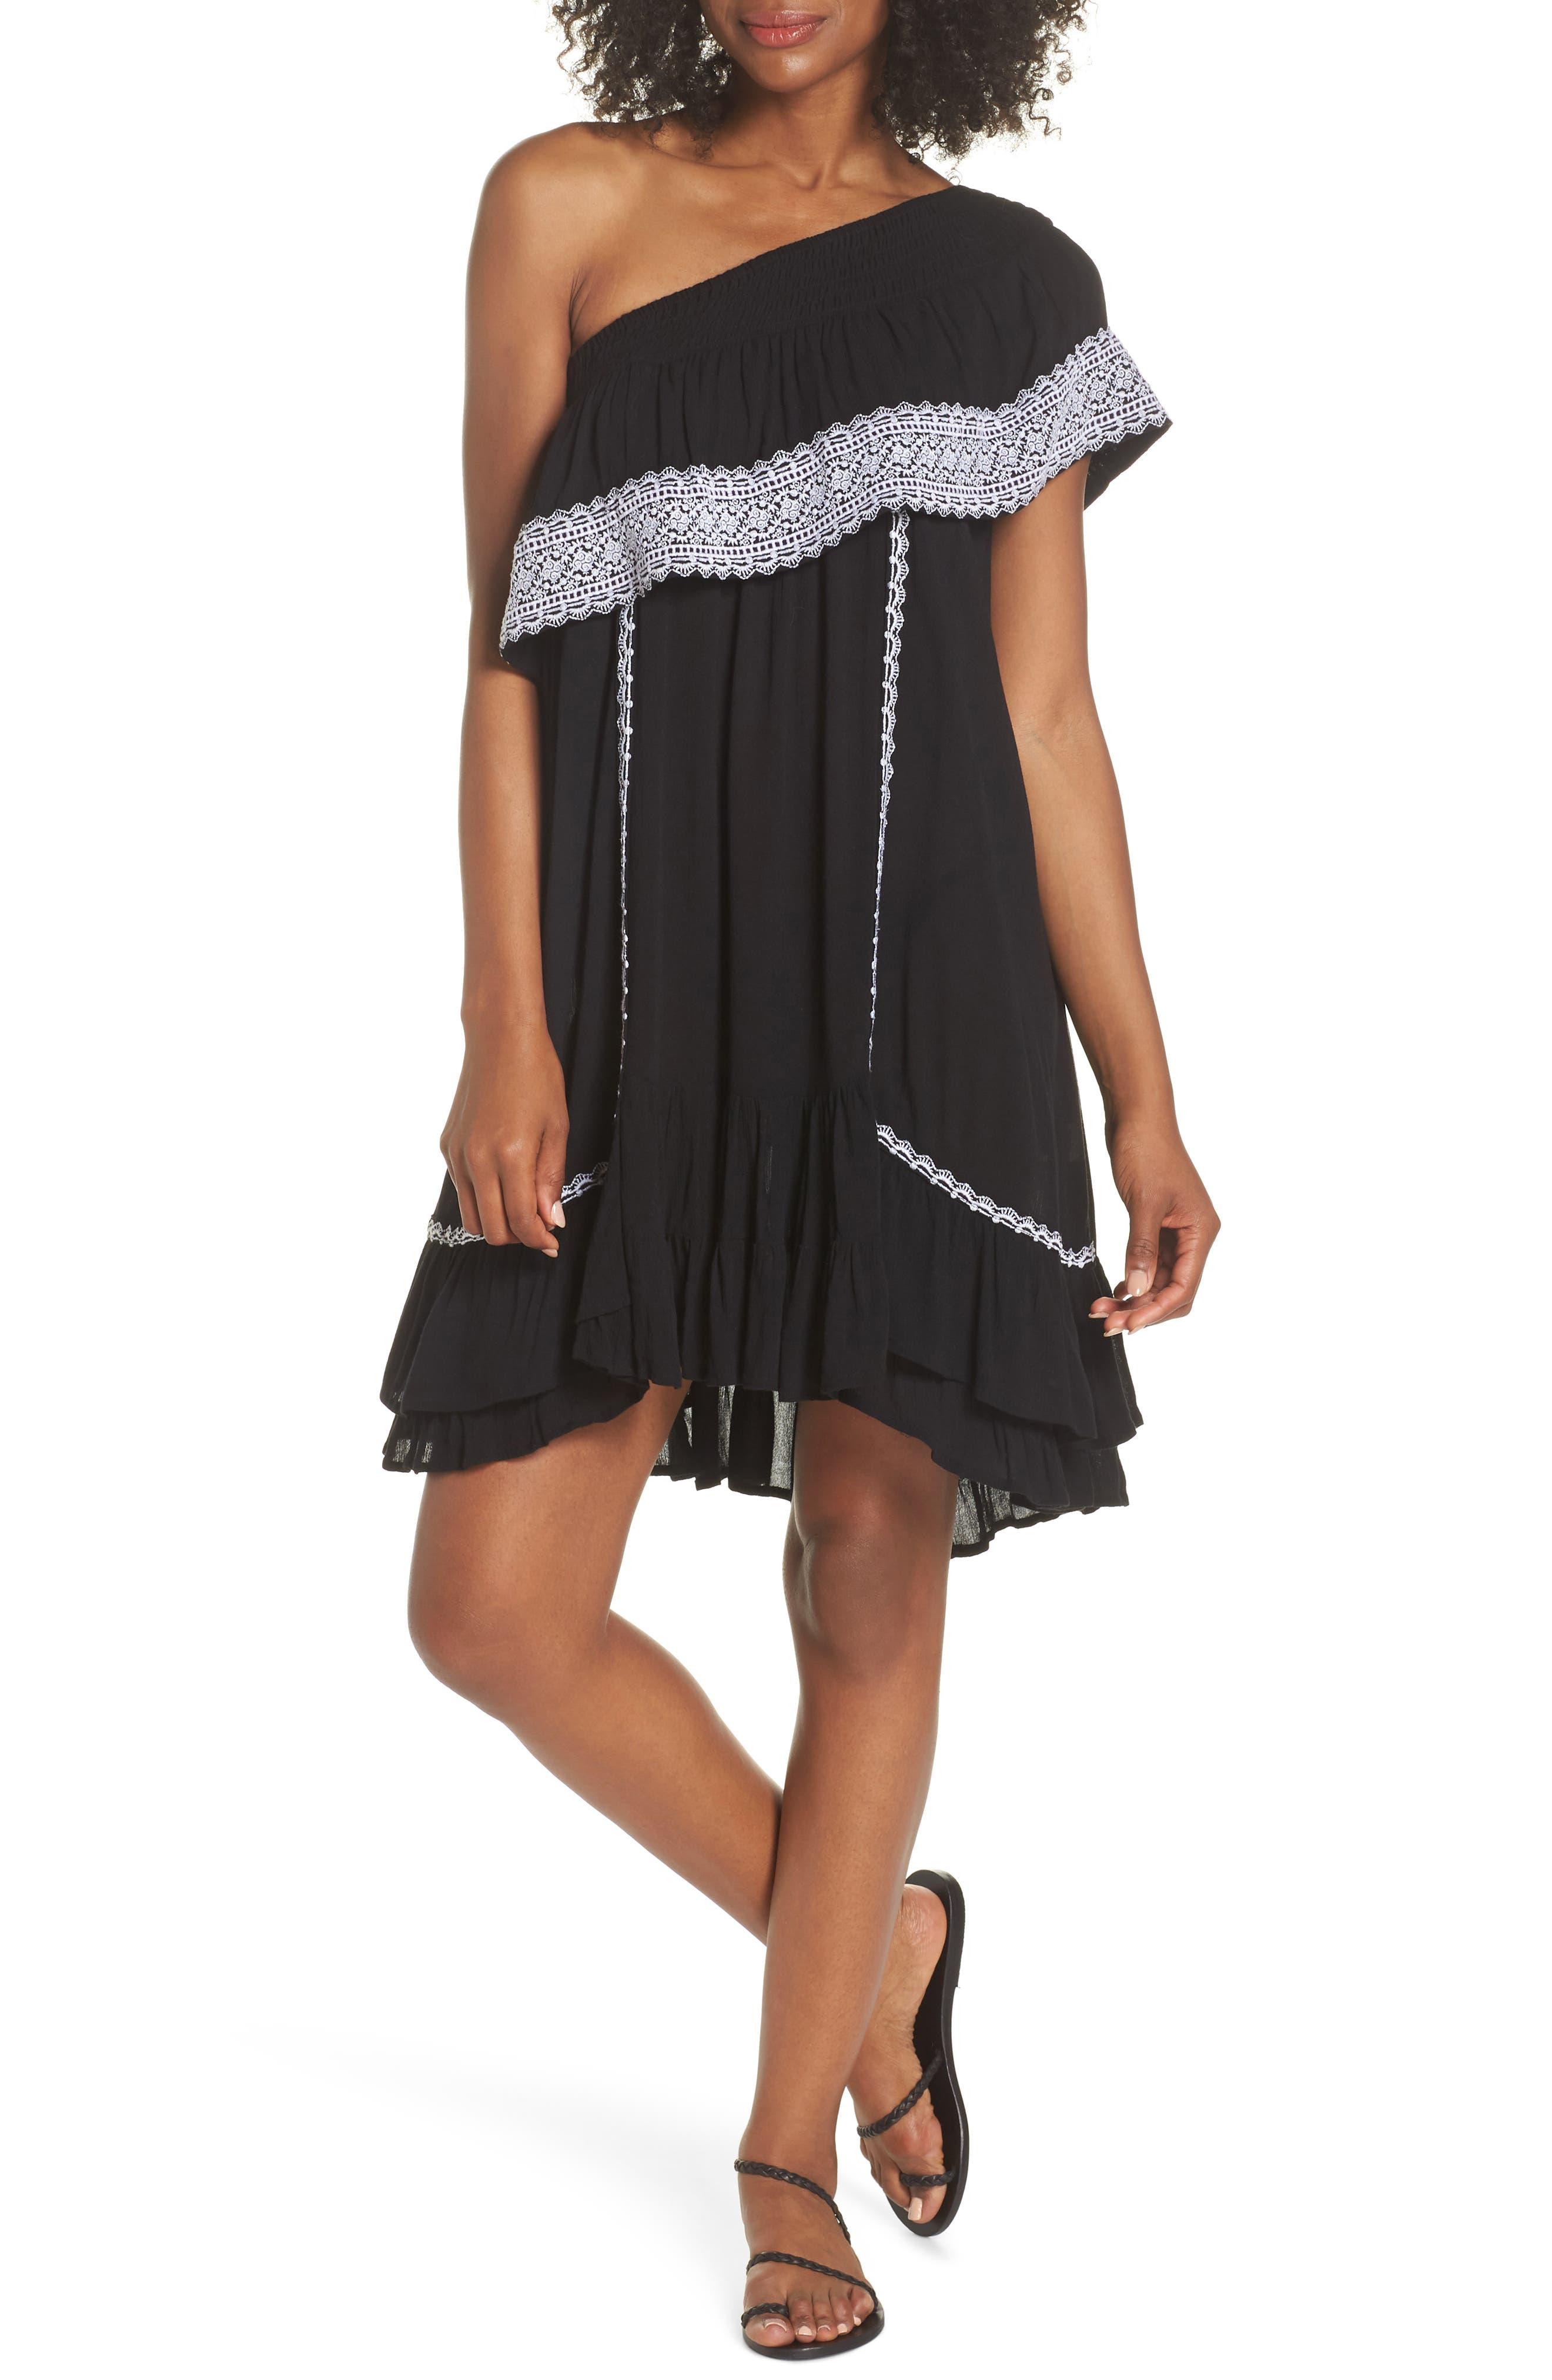 Gavin One-Shoulder Cover-Up Dress,                         Main,                         color, 002